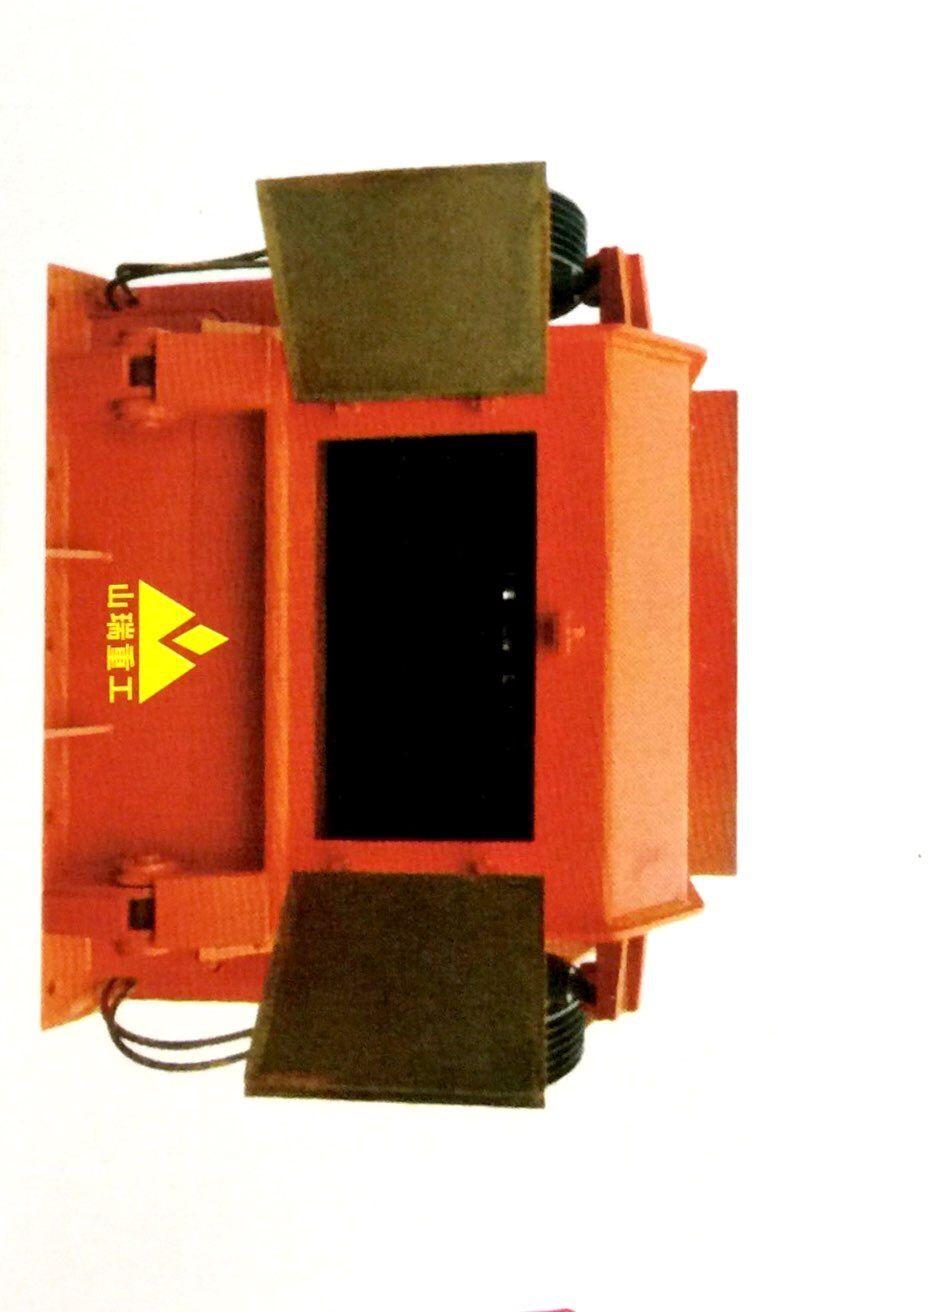 ZSJ双转子制沙整形机